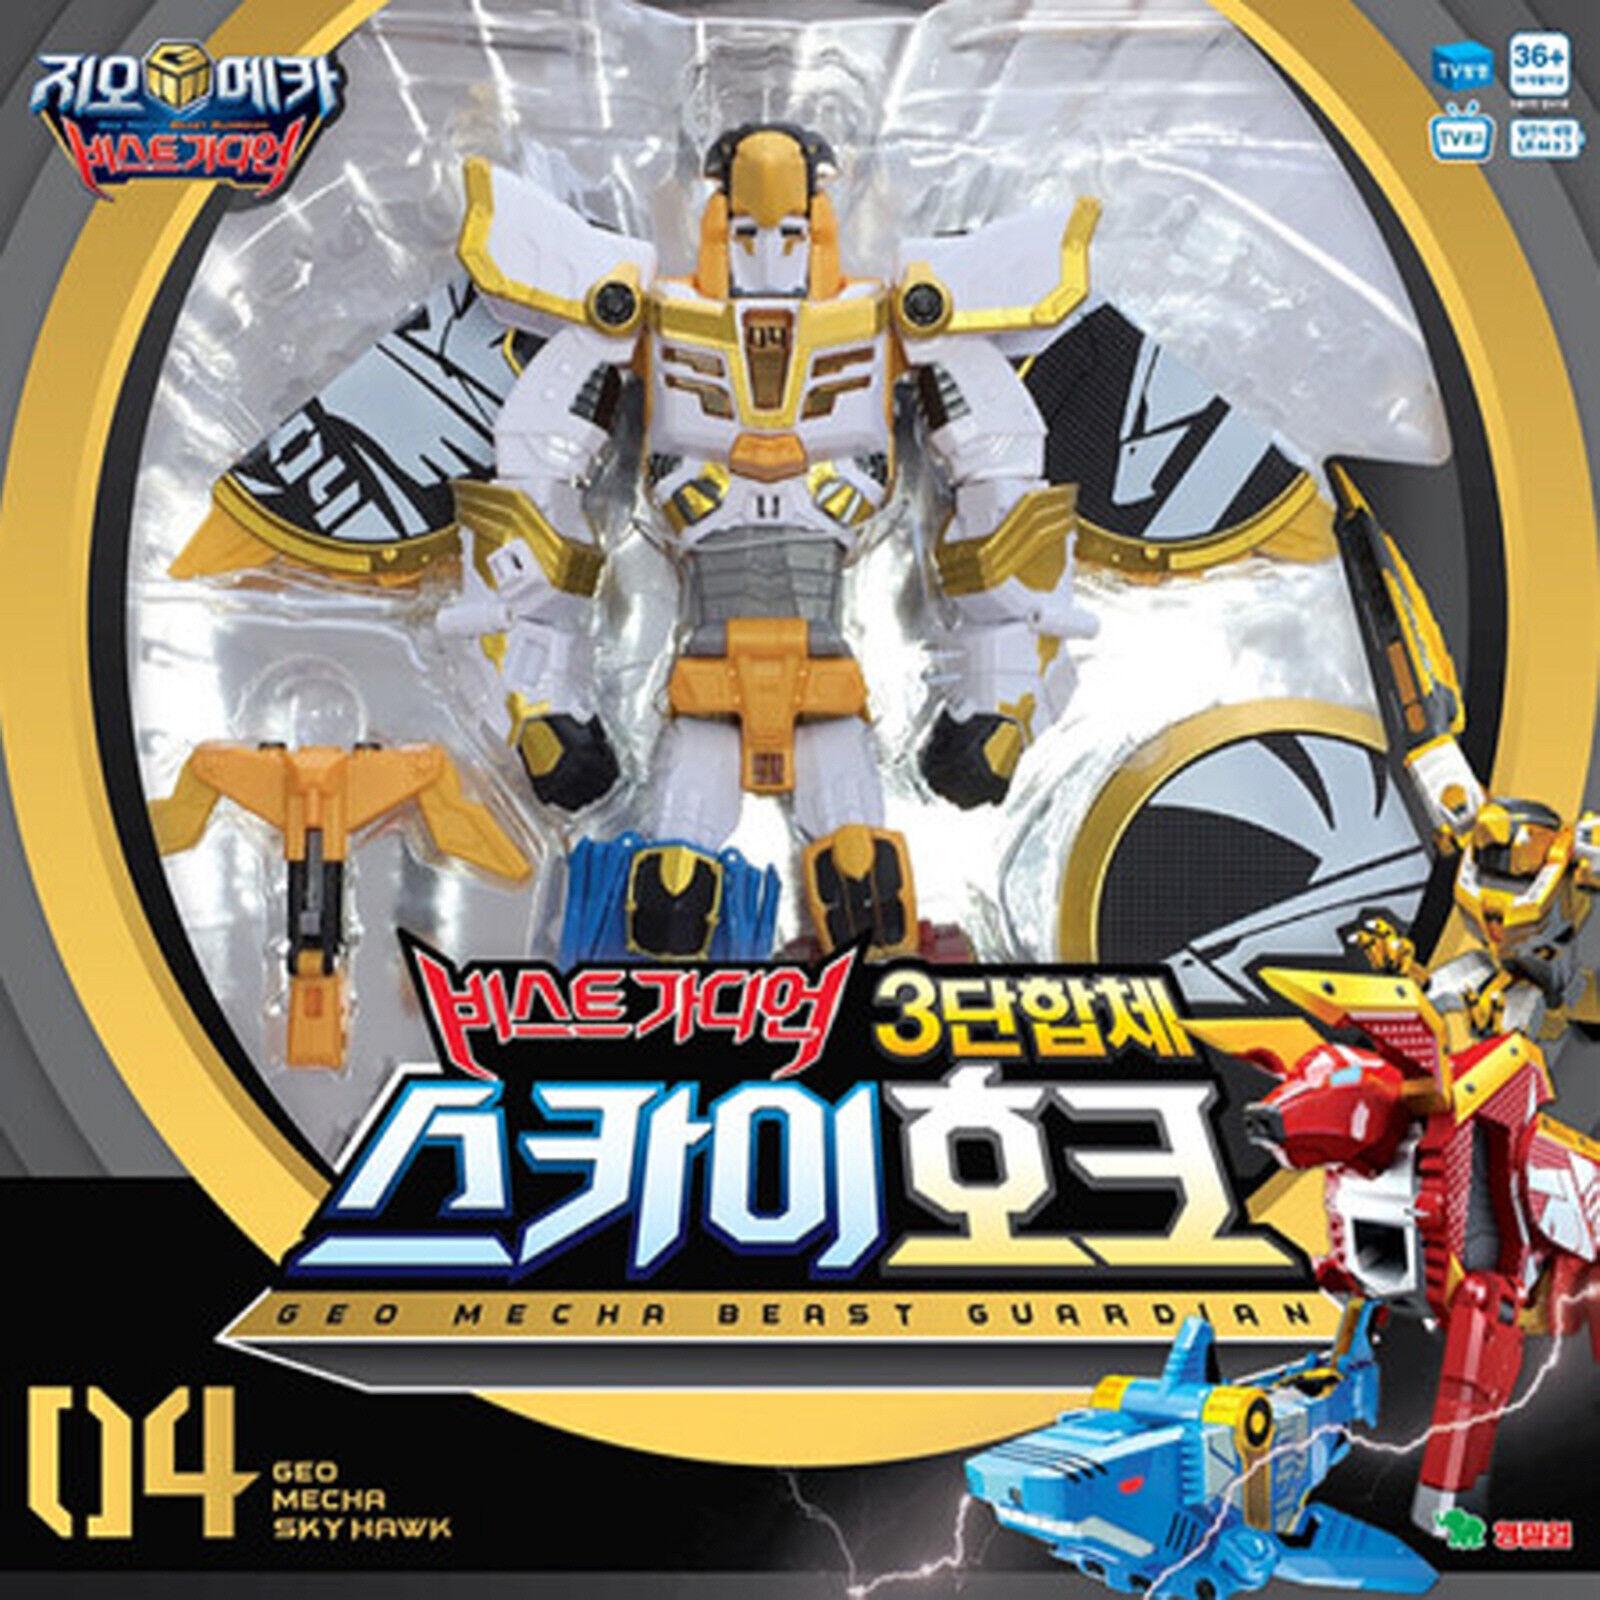 Geo Mecha Beast Guardian SKY HAWK - 3  x Transformer Copolymer Robot Korean Toys  chaud